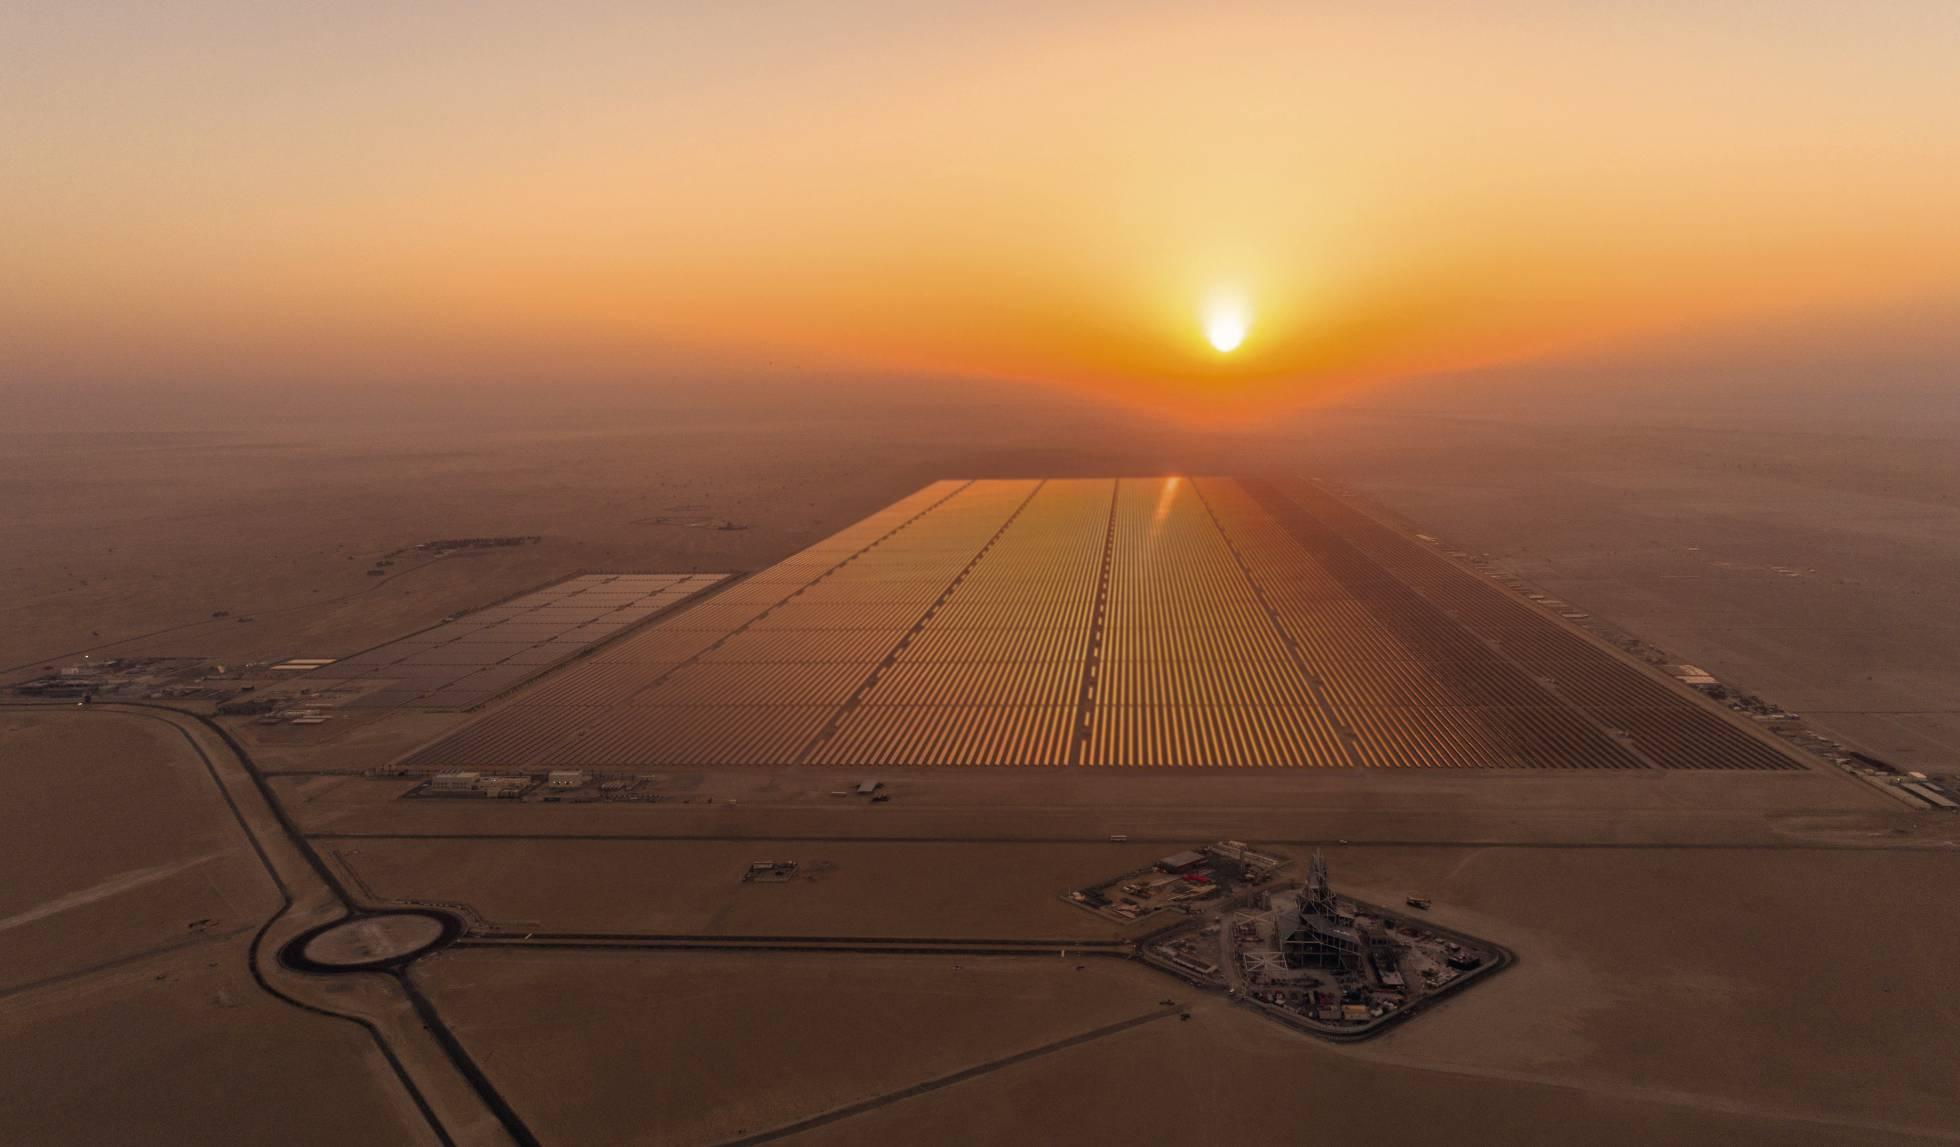 planta-solar-abu-dhabi